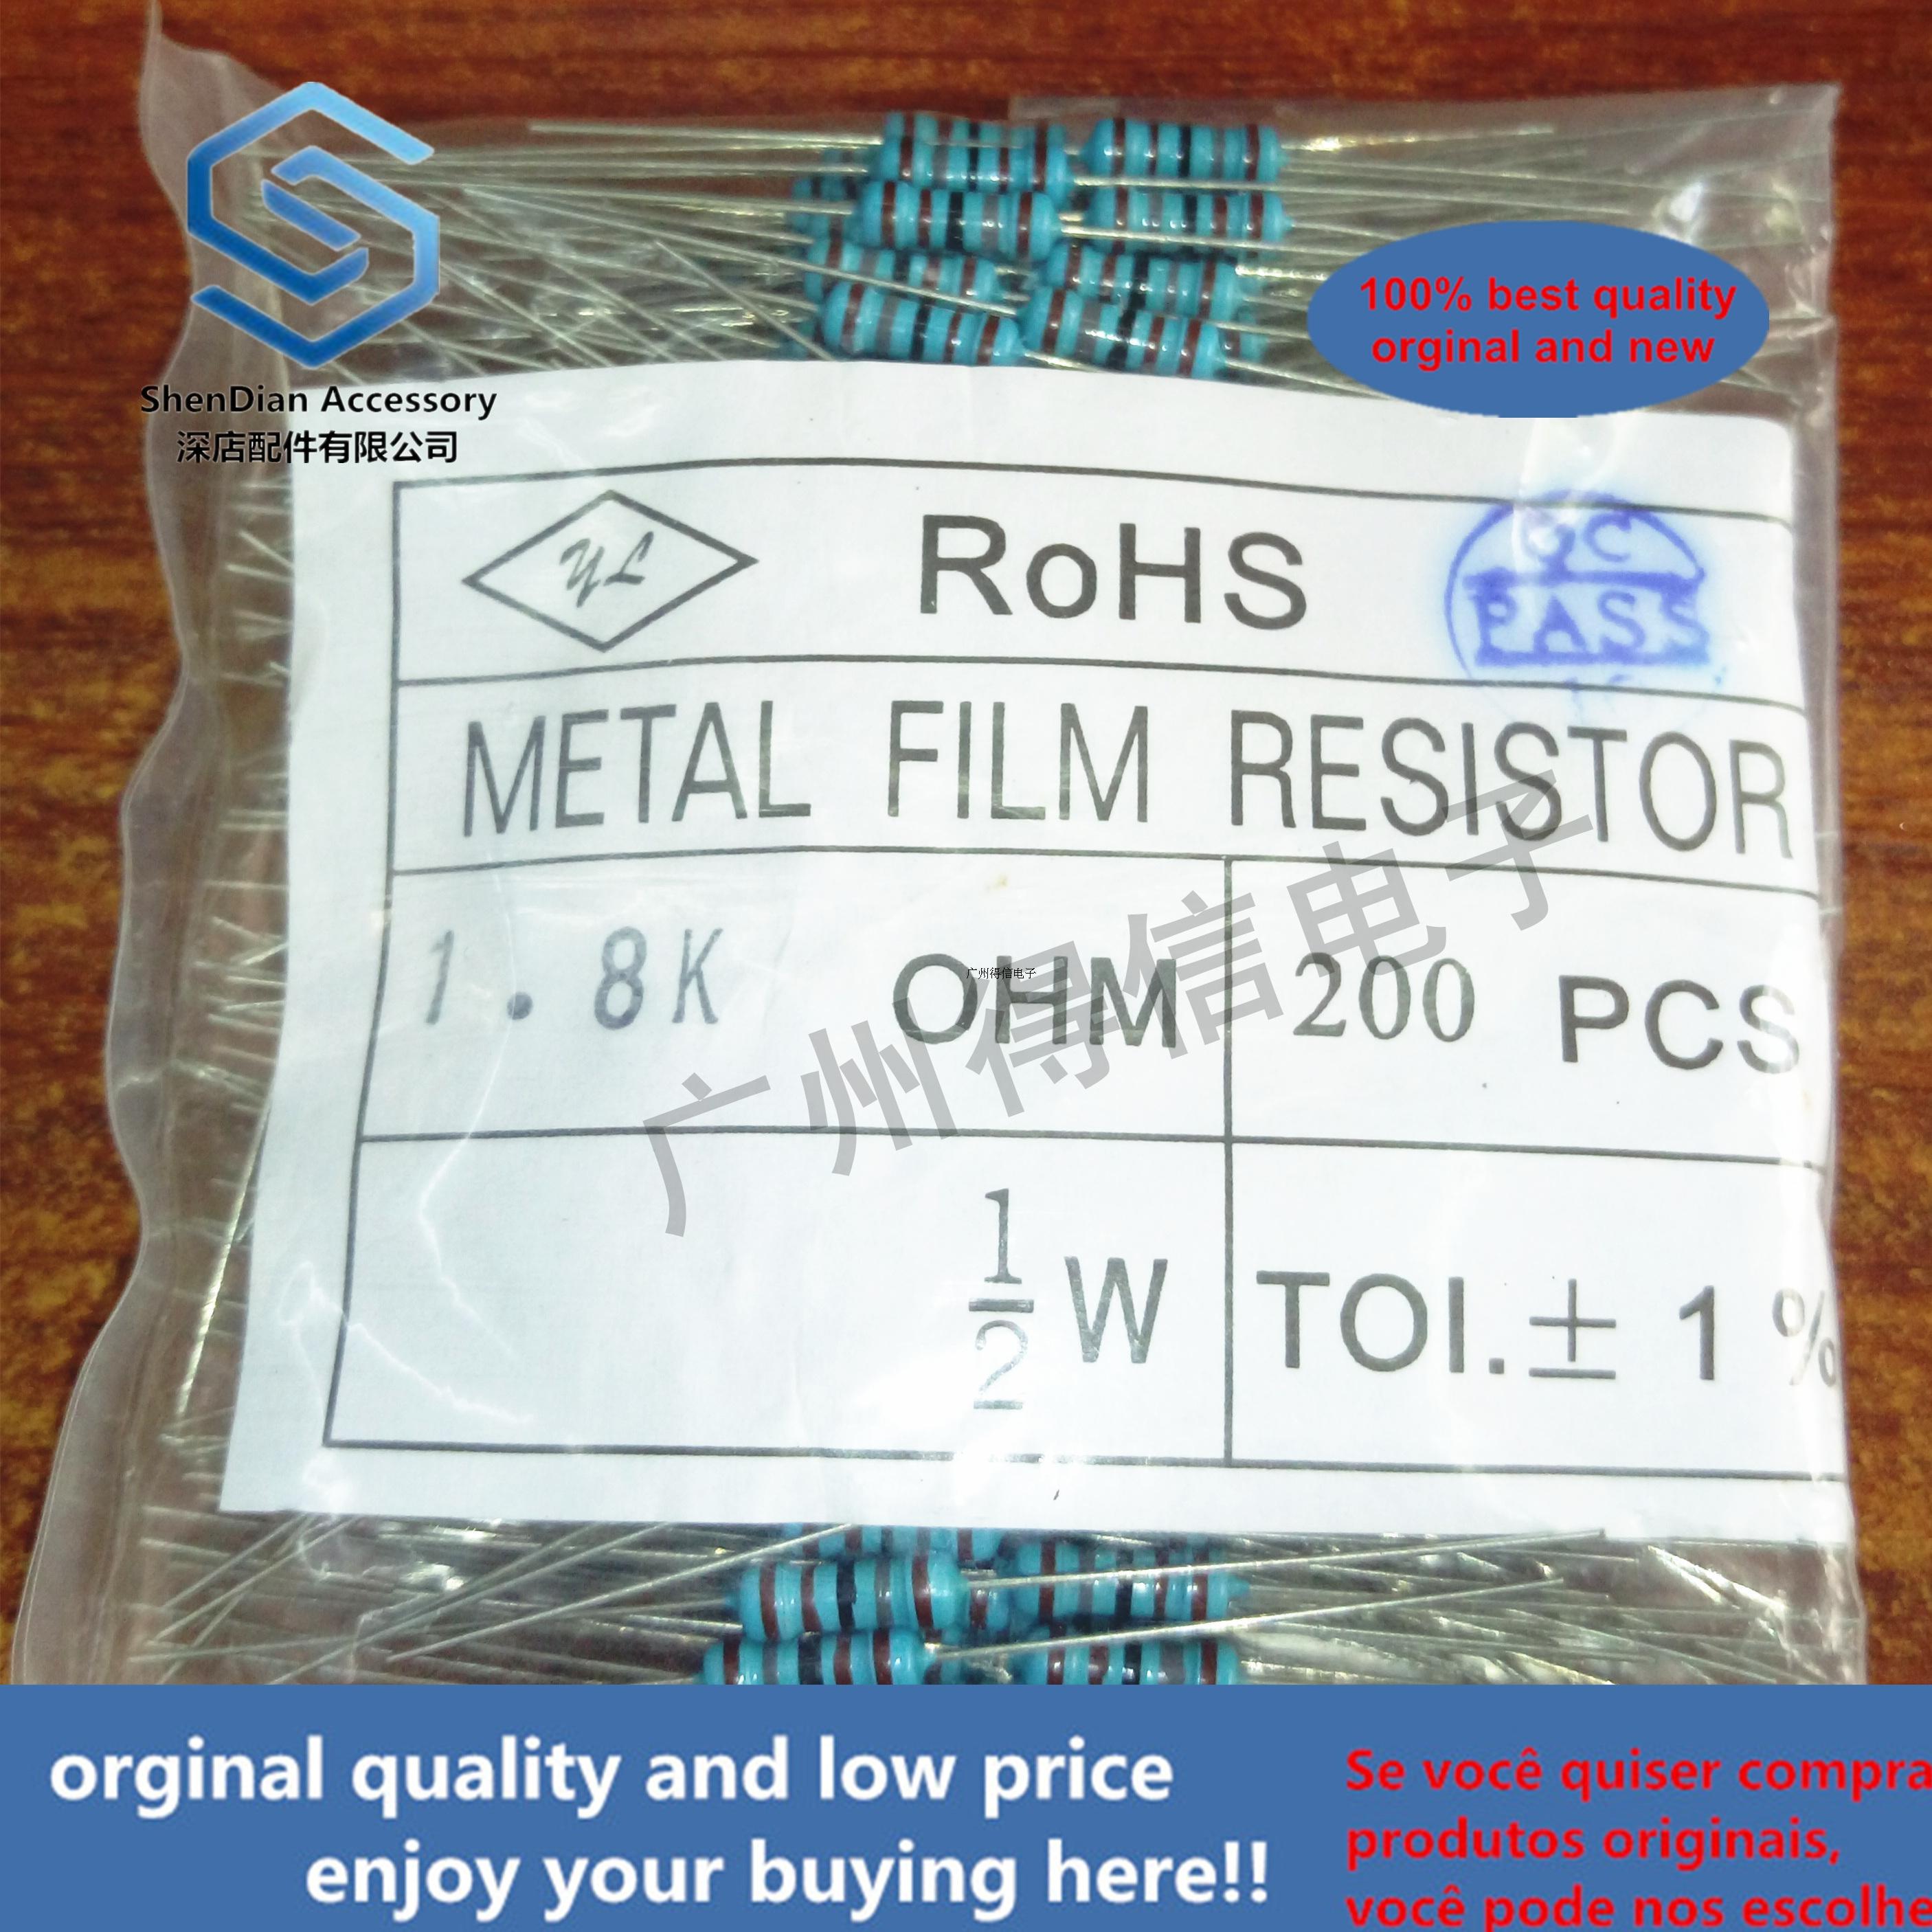 200pcs 1 / 2W 11K 1% Brand New Metal Film Iron Feet Resistor Bag 200 Pcs